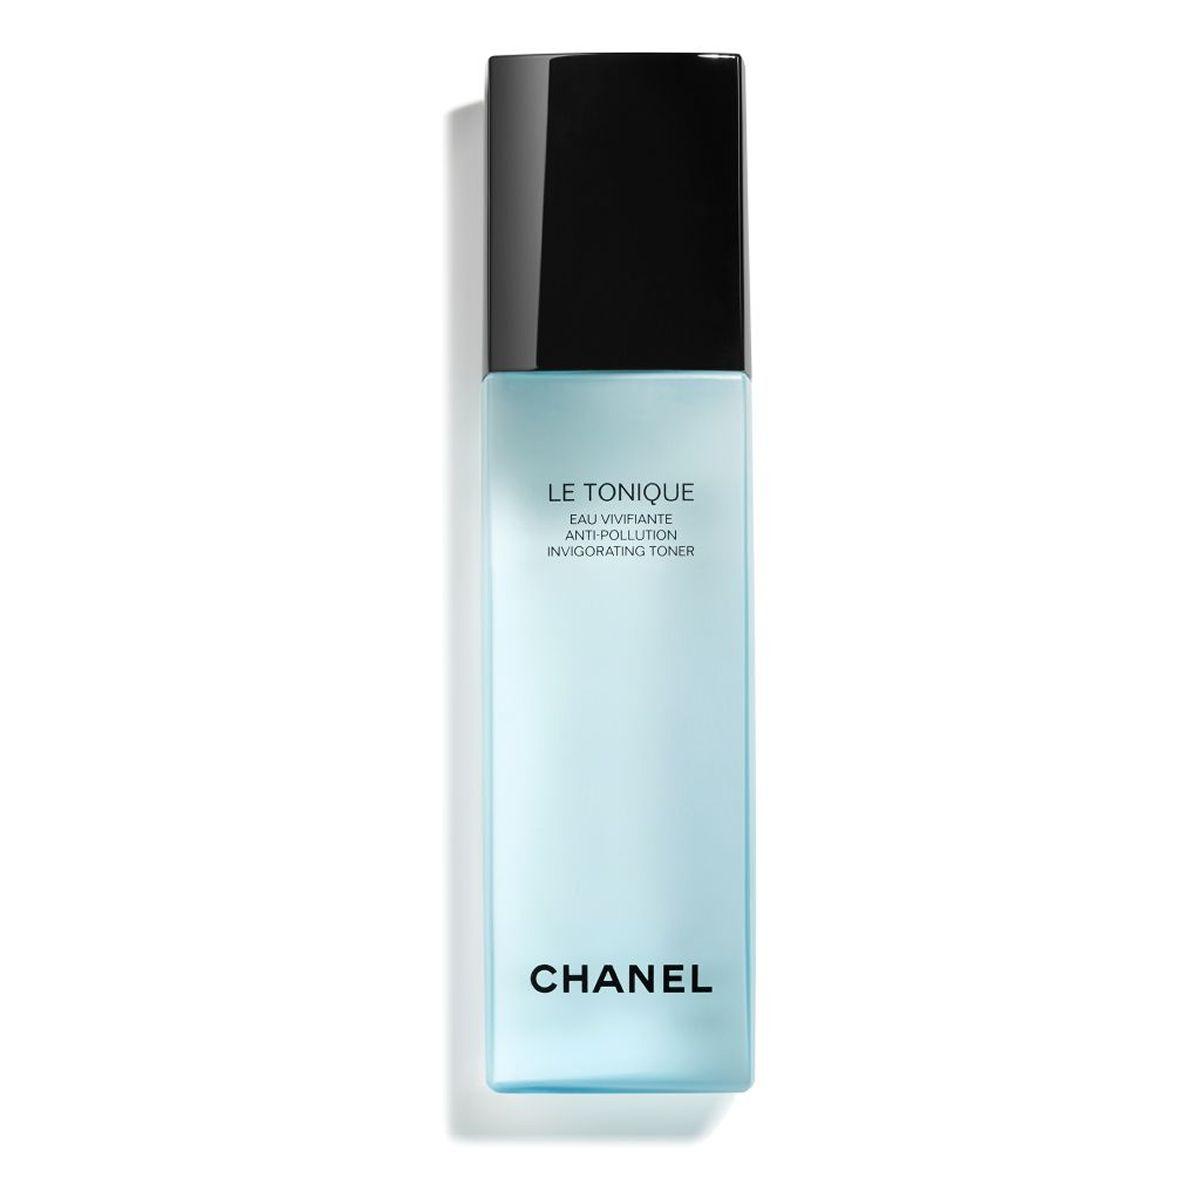 CHANEL Skin Care Treatments   Serums - Macy s 5019b951c1